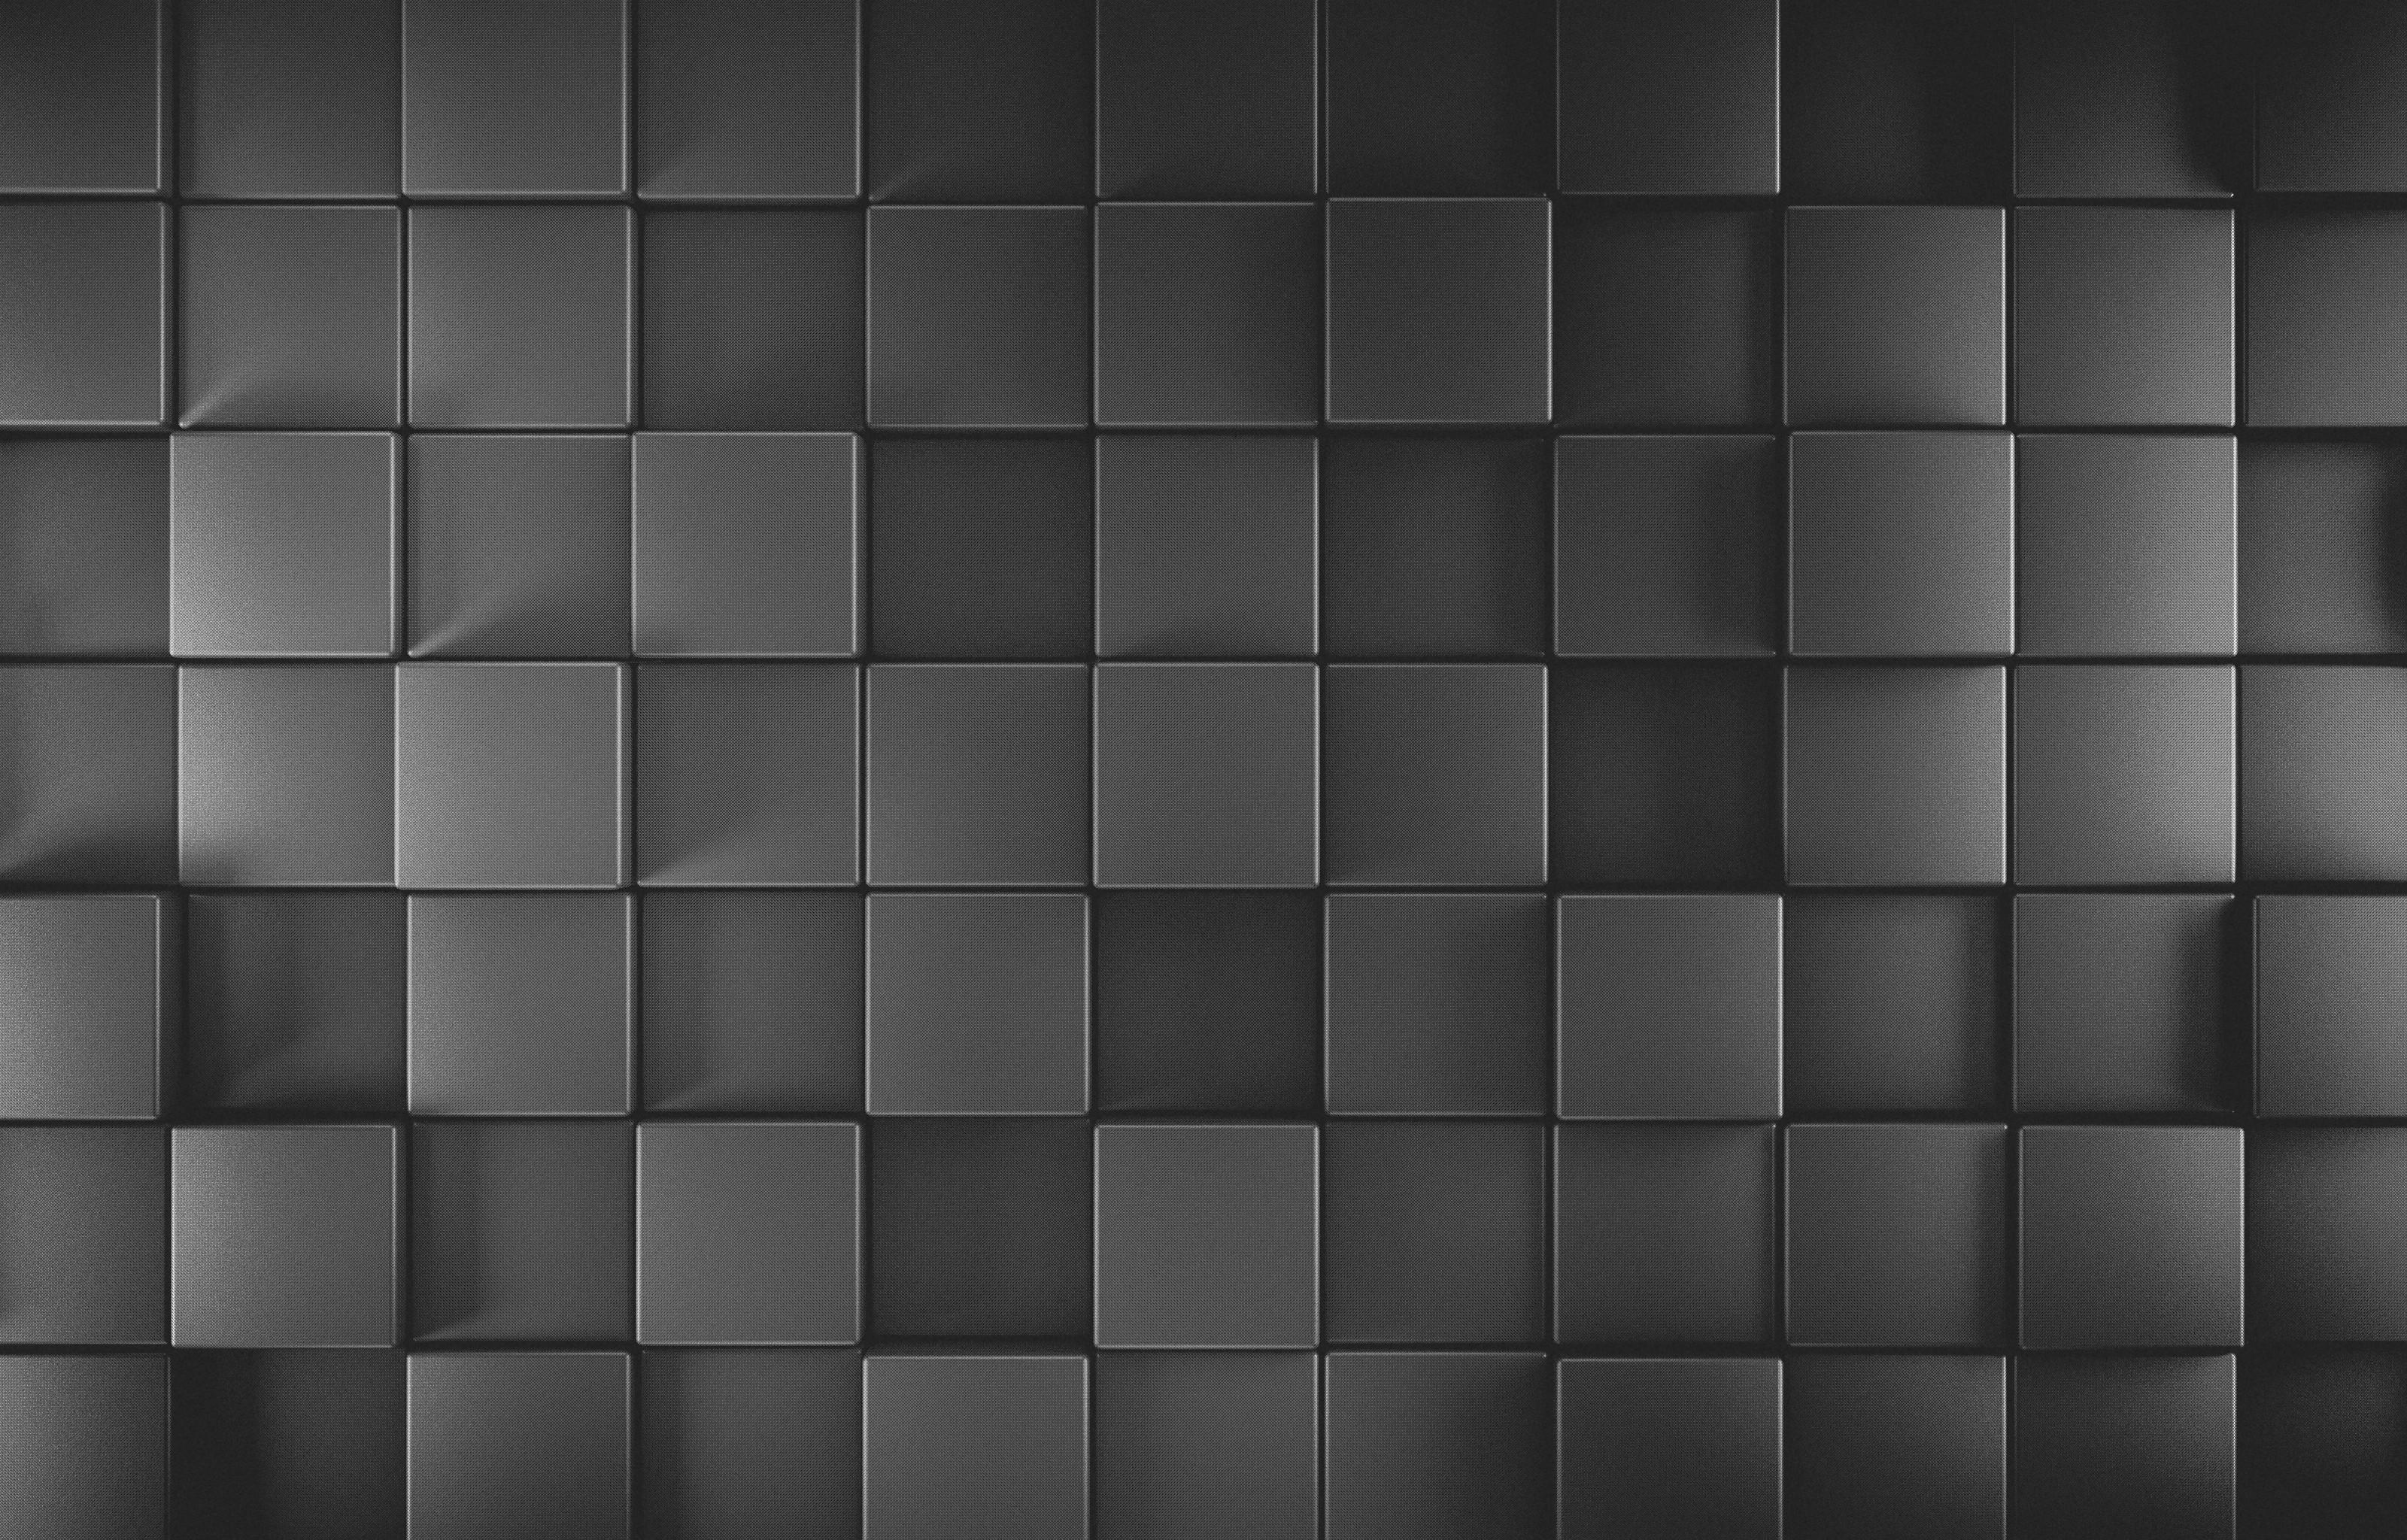 Wallpaper : satu warna, abstrak, dinding, simetri, pola